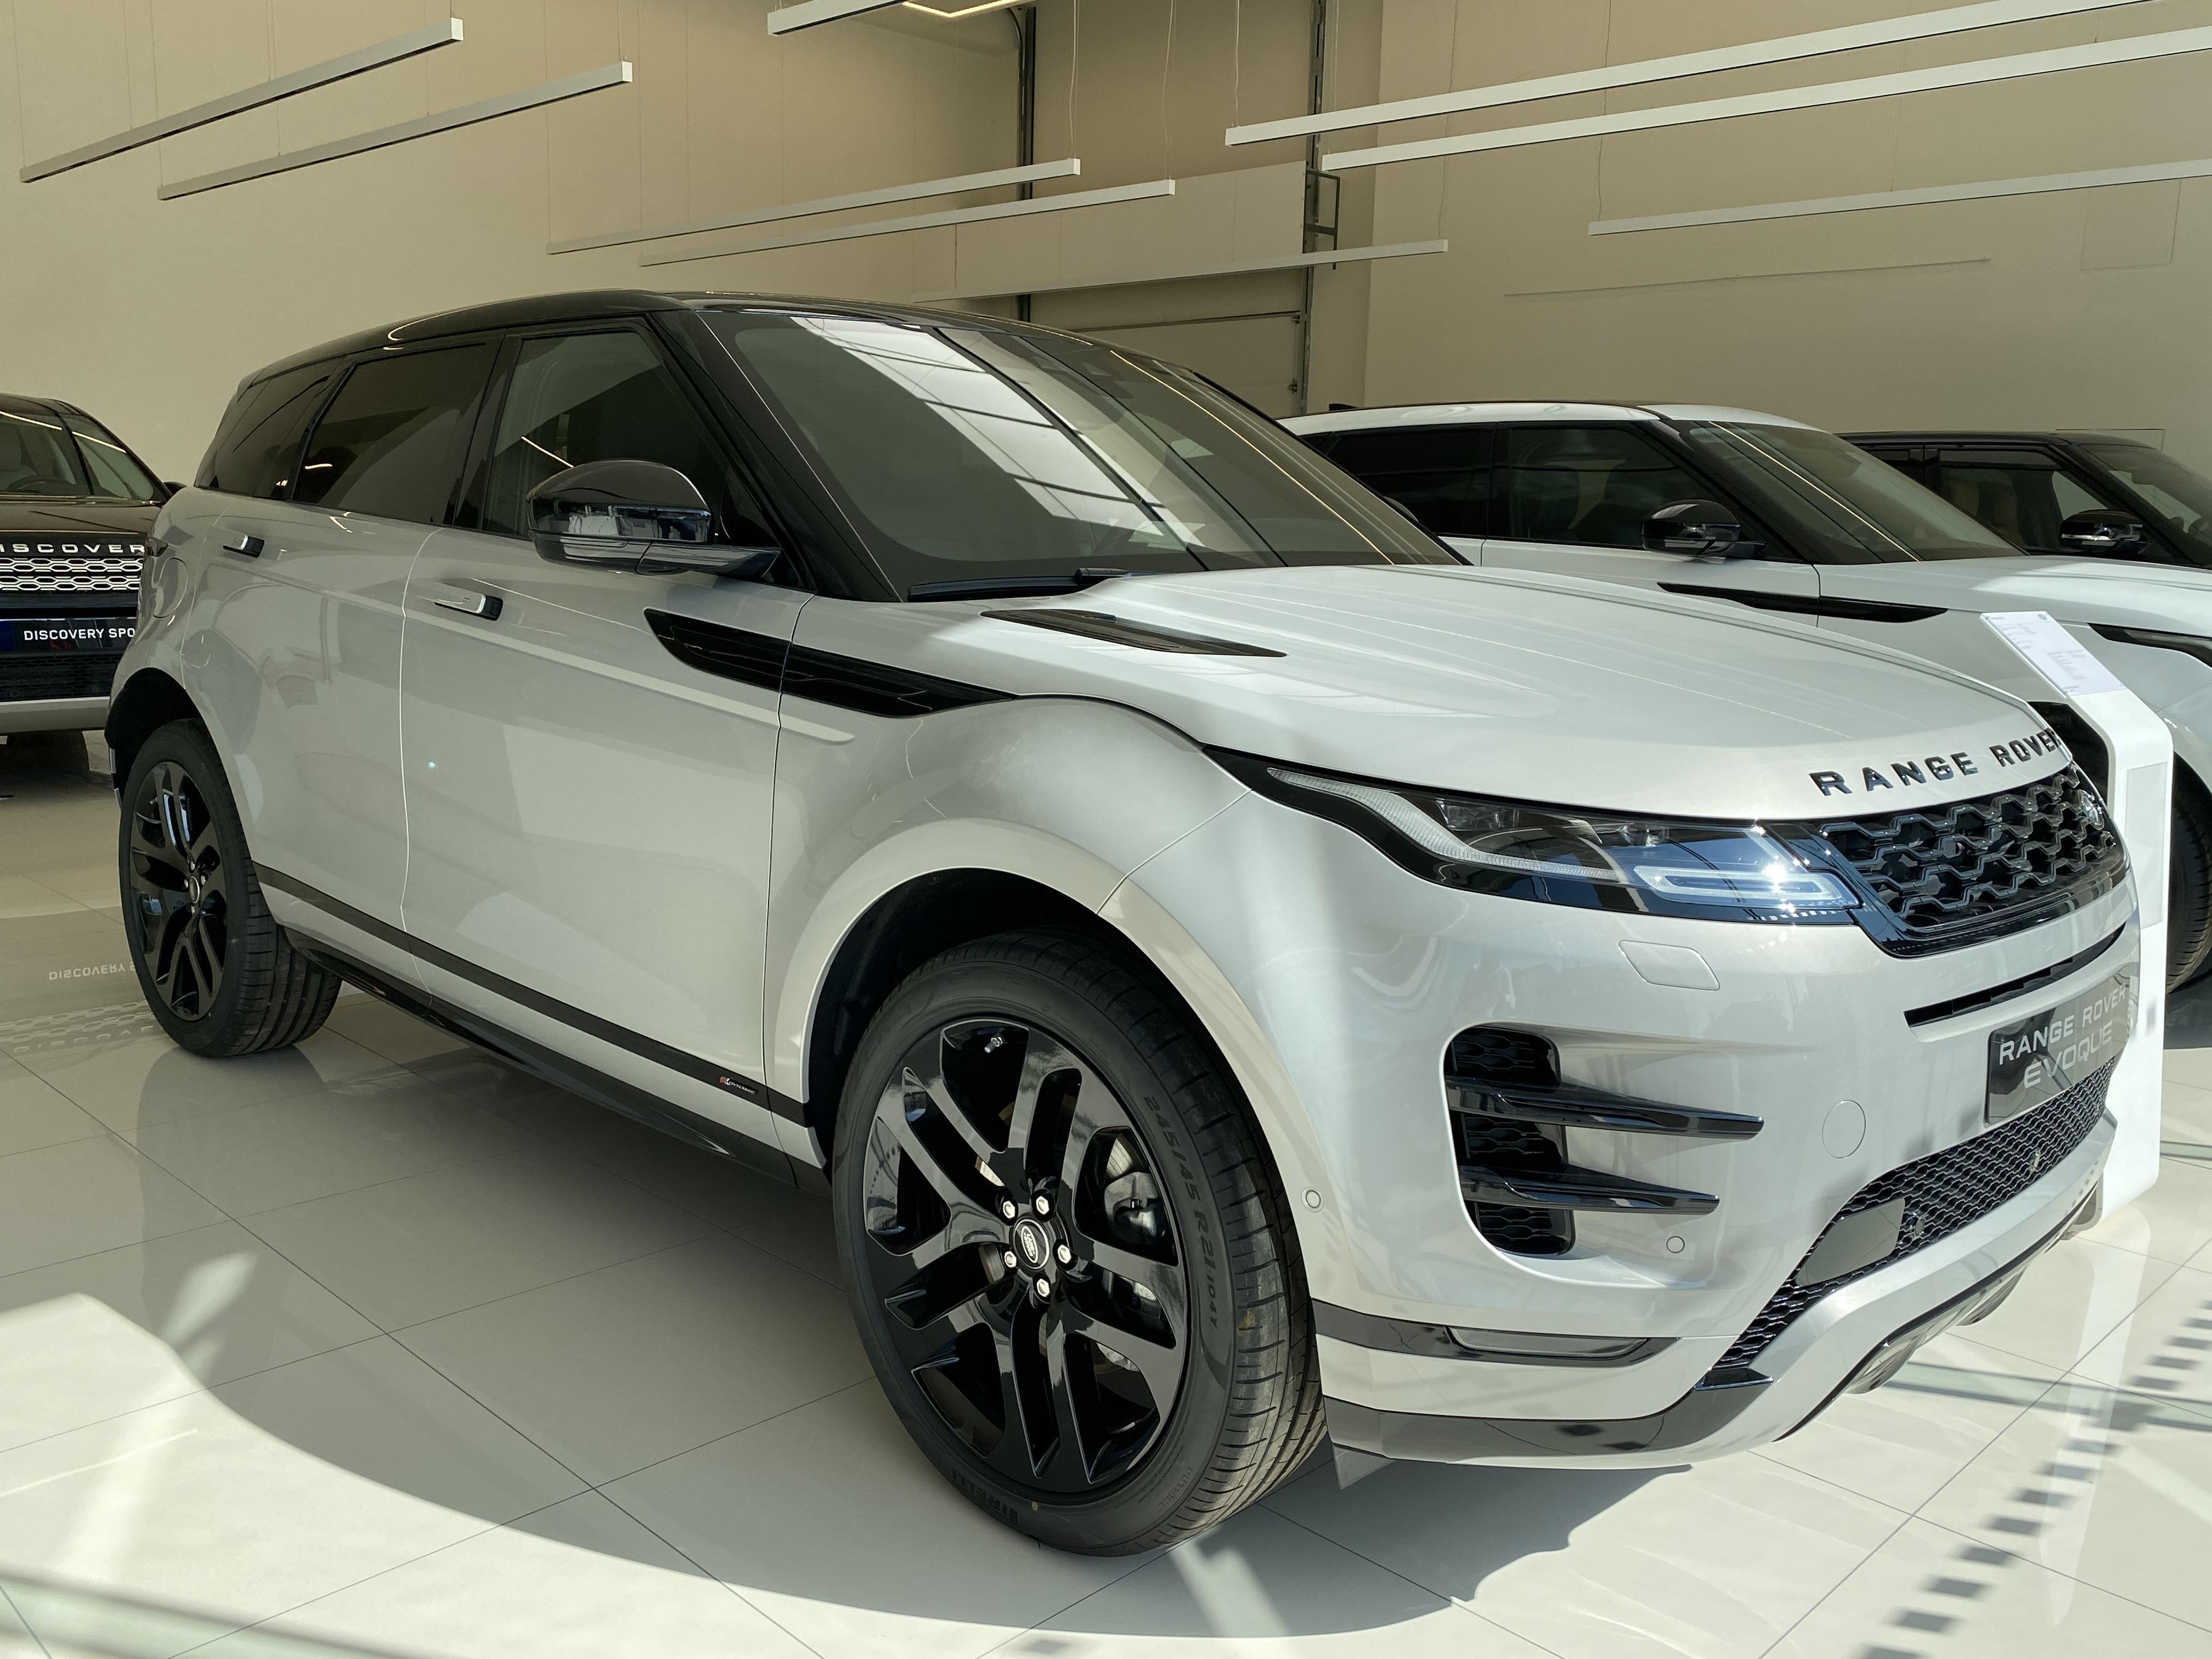 Land Rover Range Rover Evoque R-Dynamic HSE